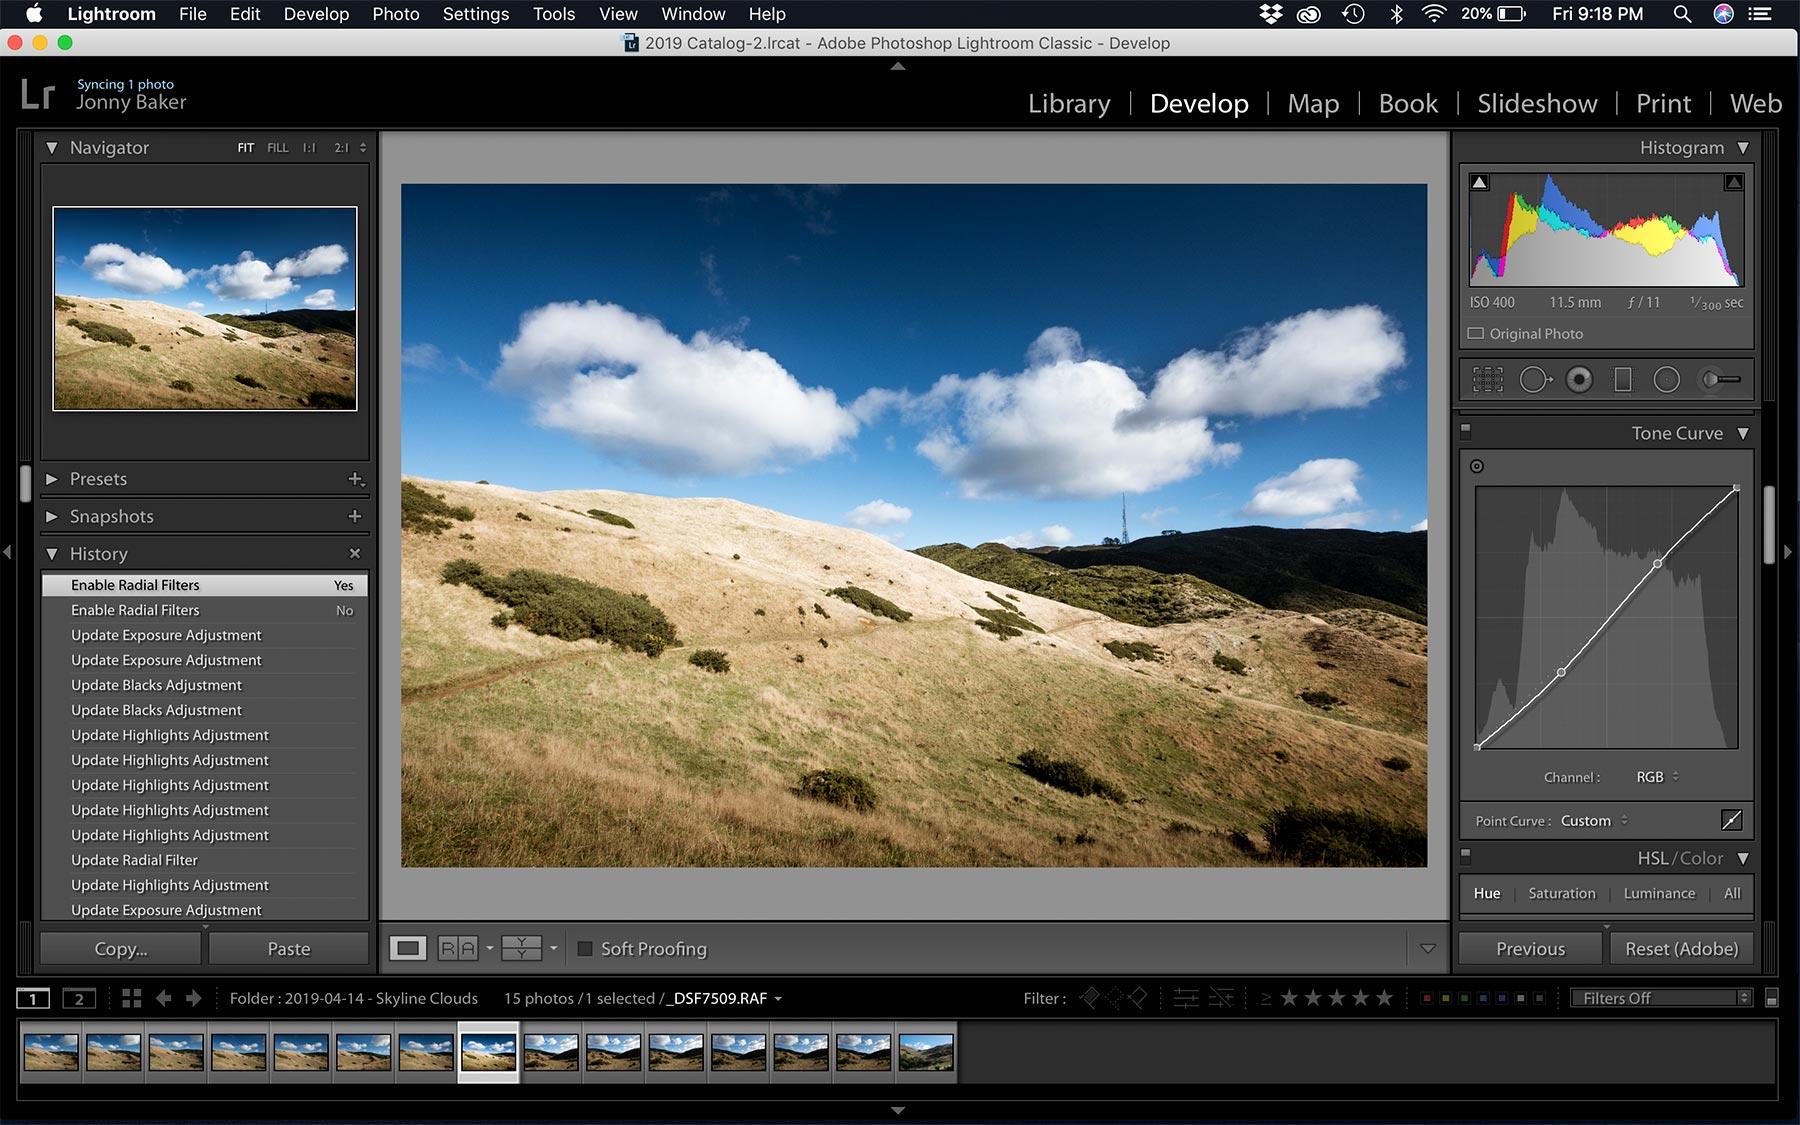 Adobe Photoshop Lightroom 6.0 Download - xtrabrown